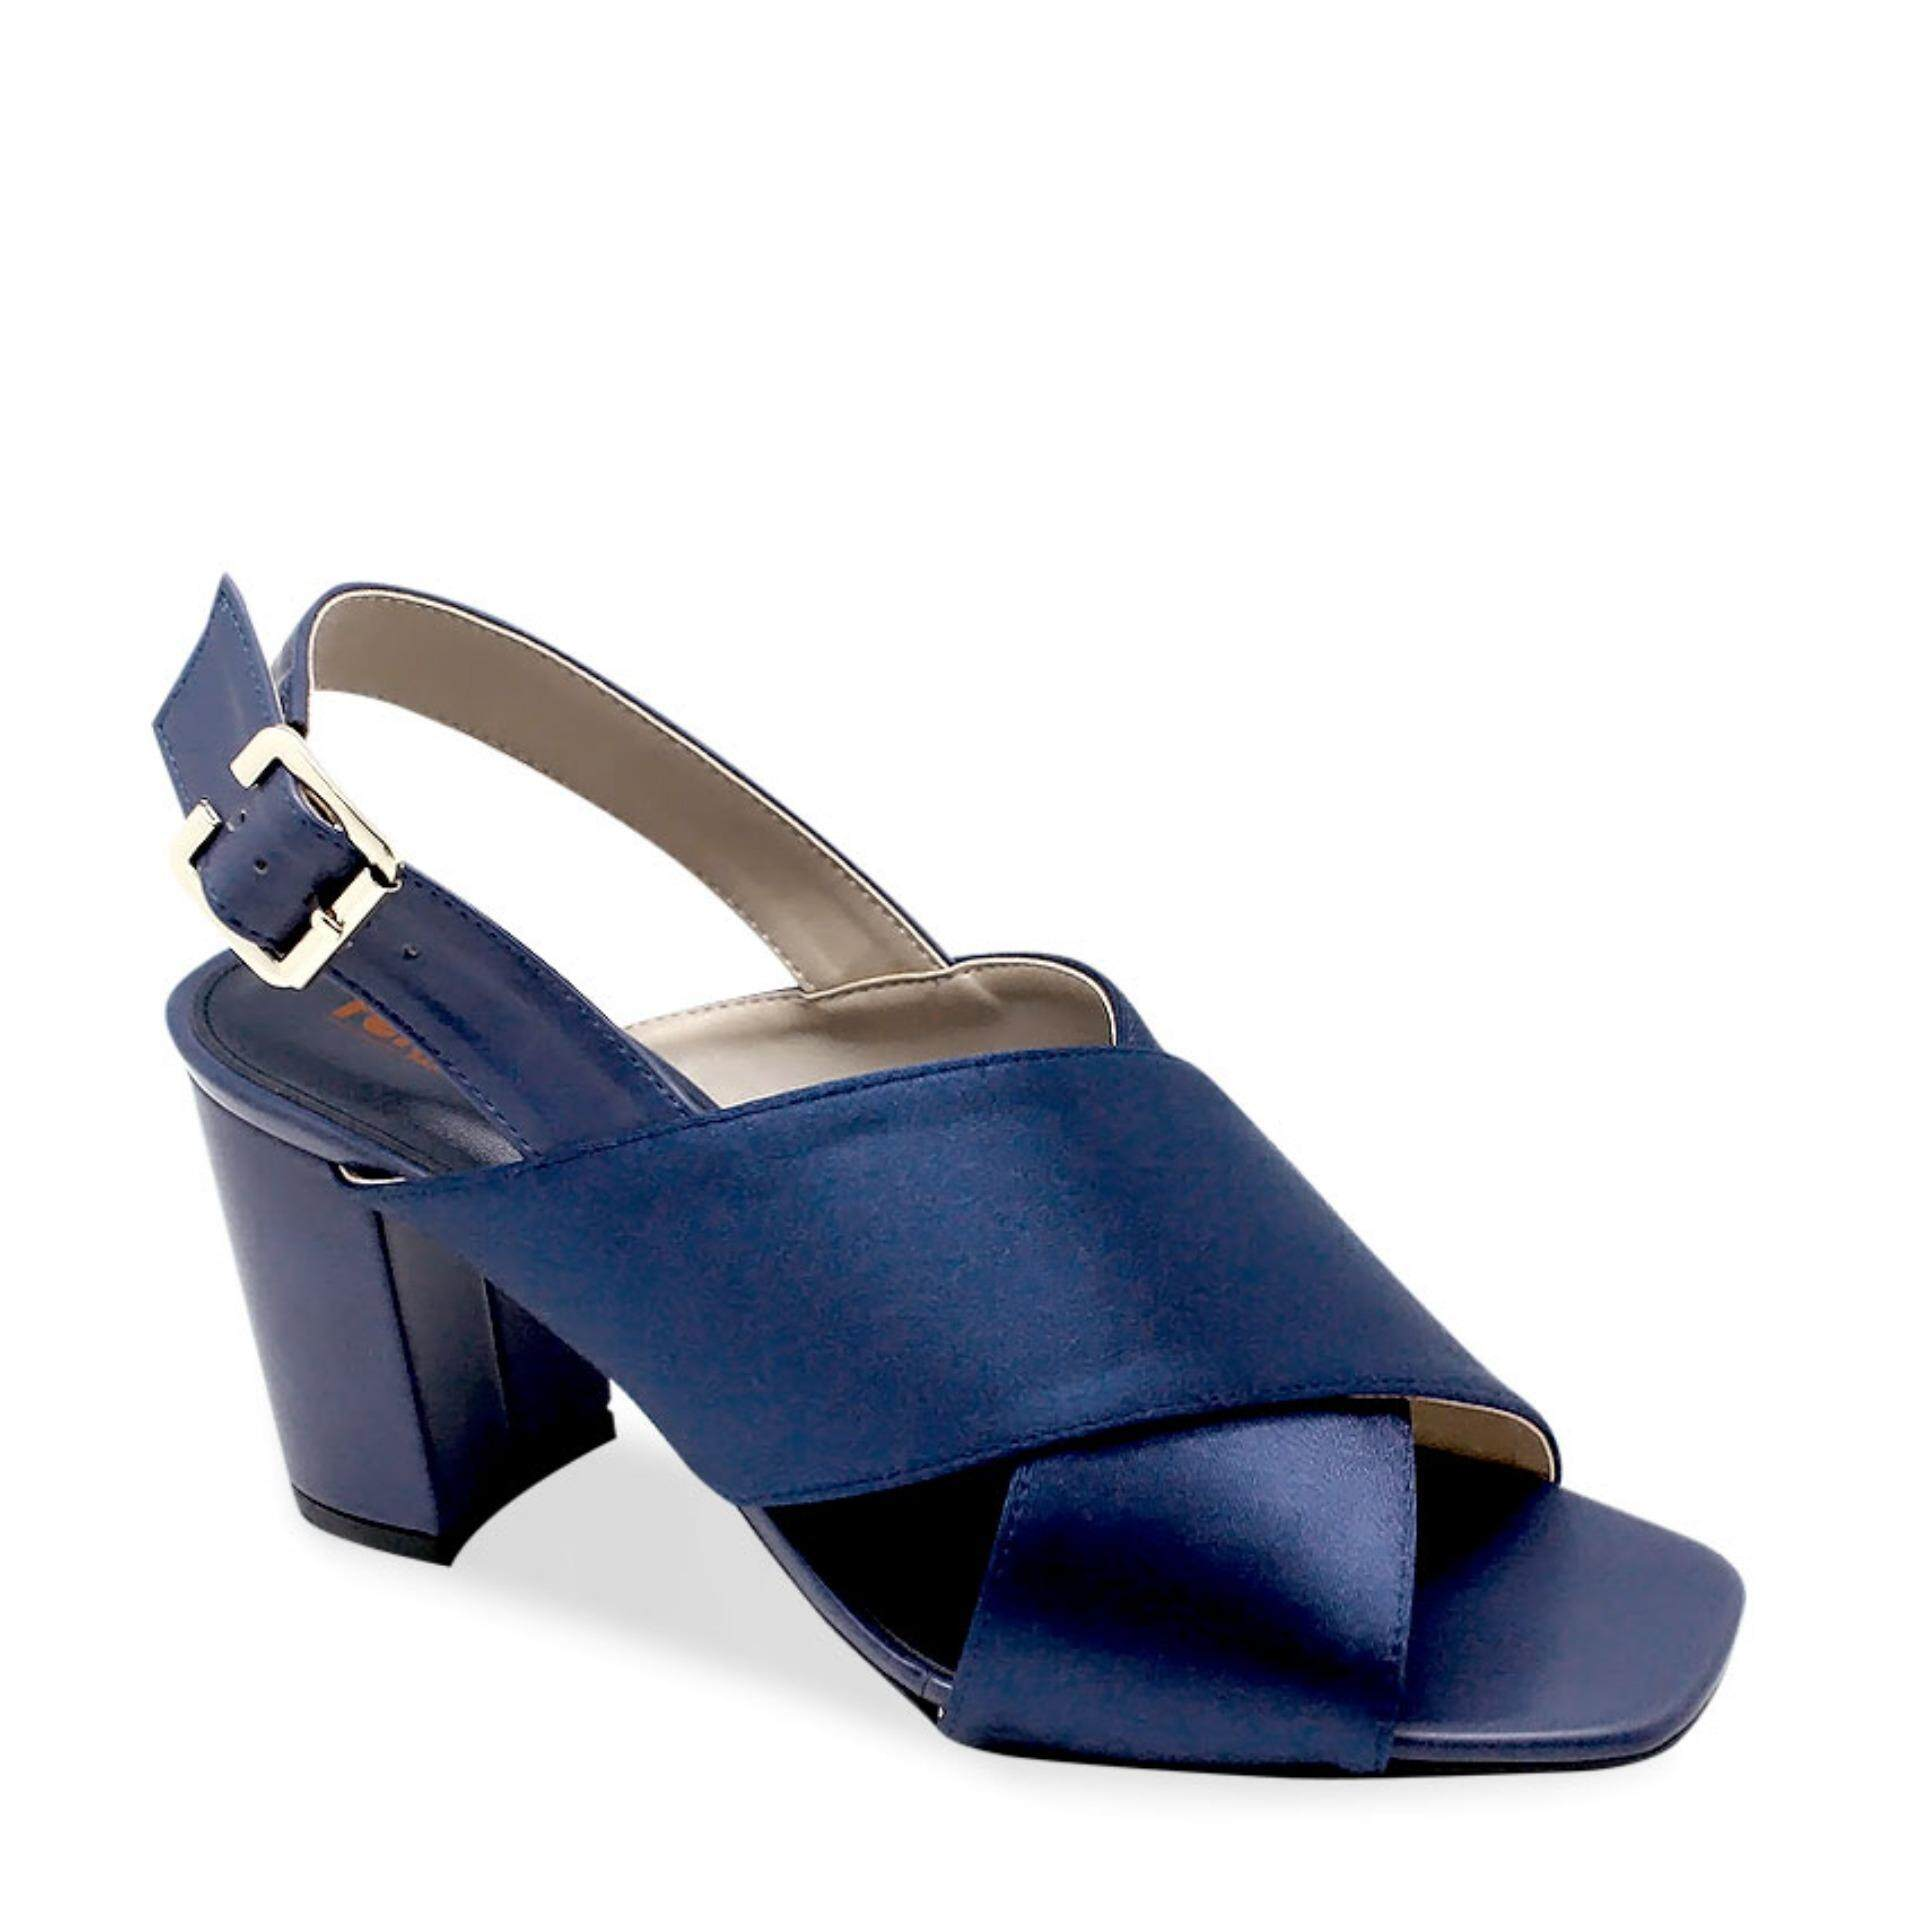 Renoma Women Shoes Minimalist Styles Block Heels Sandals In Dark Blue Color Hot Deals